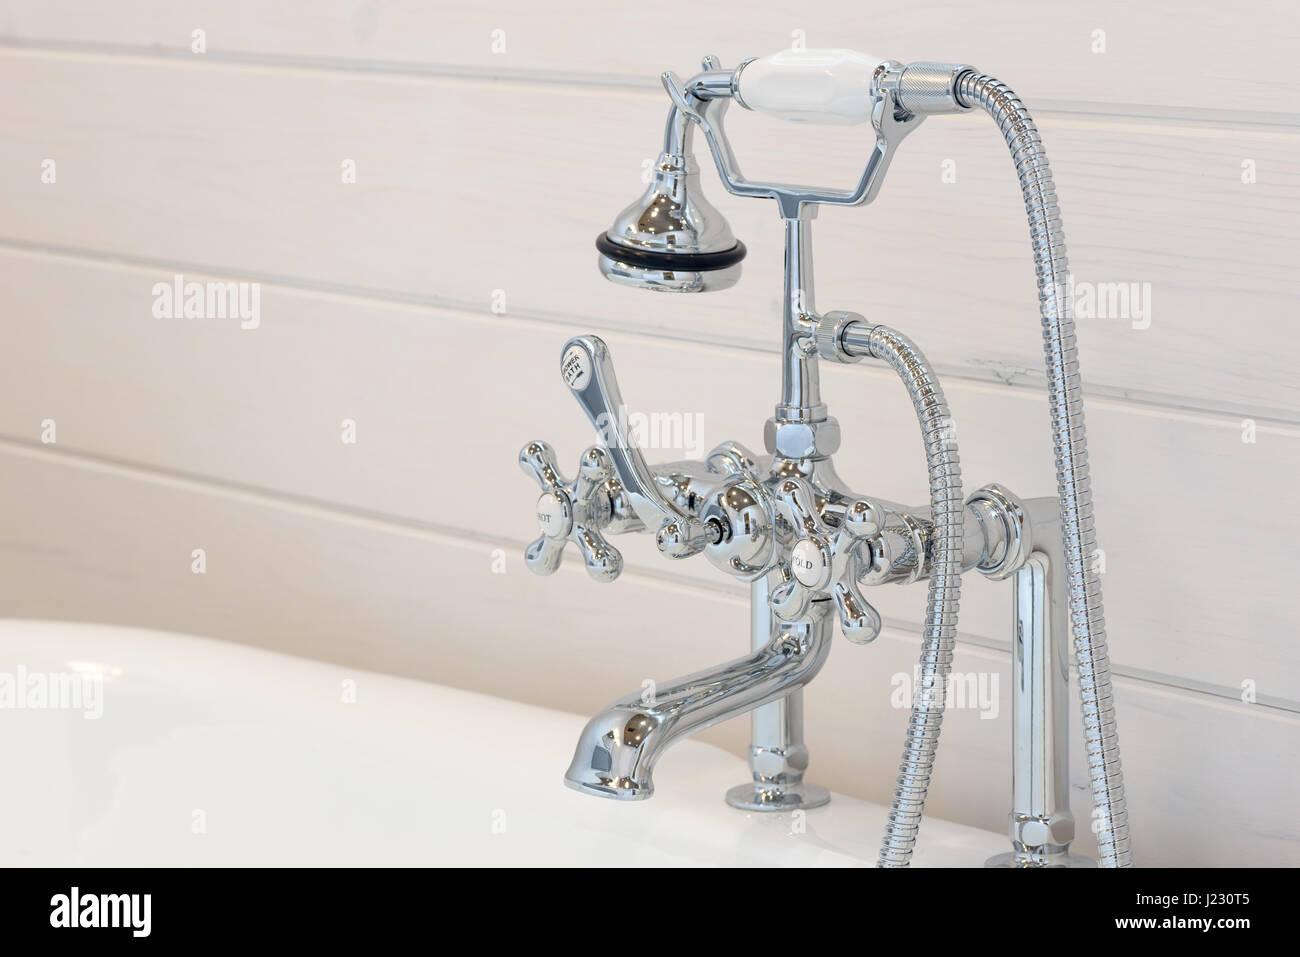 https www alamy com stock photo vintage bathtub faucet and shower head 138978789 html